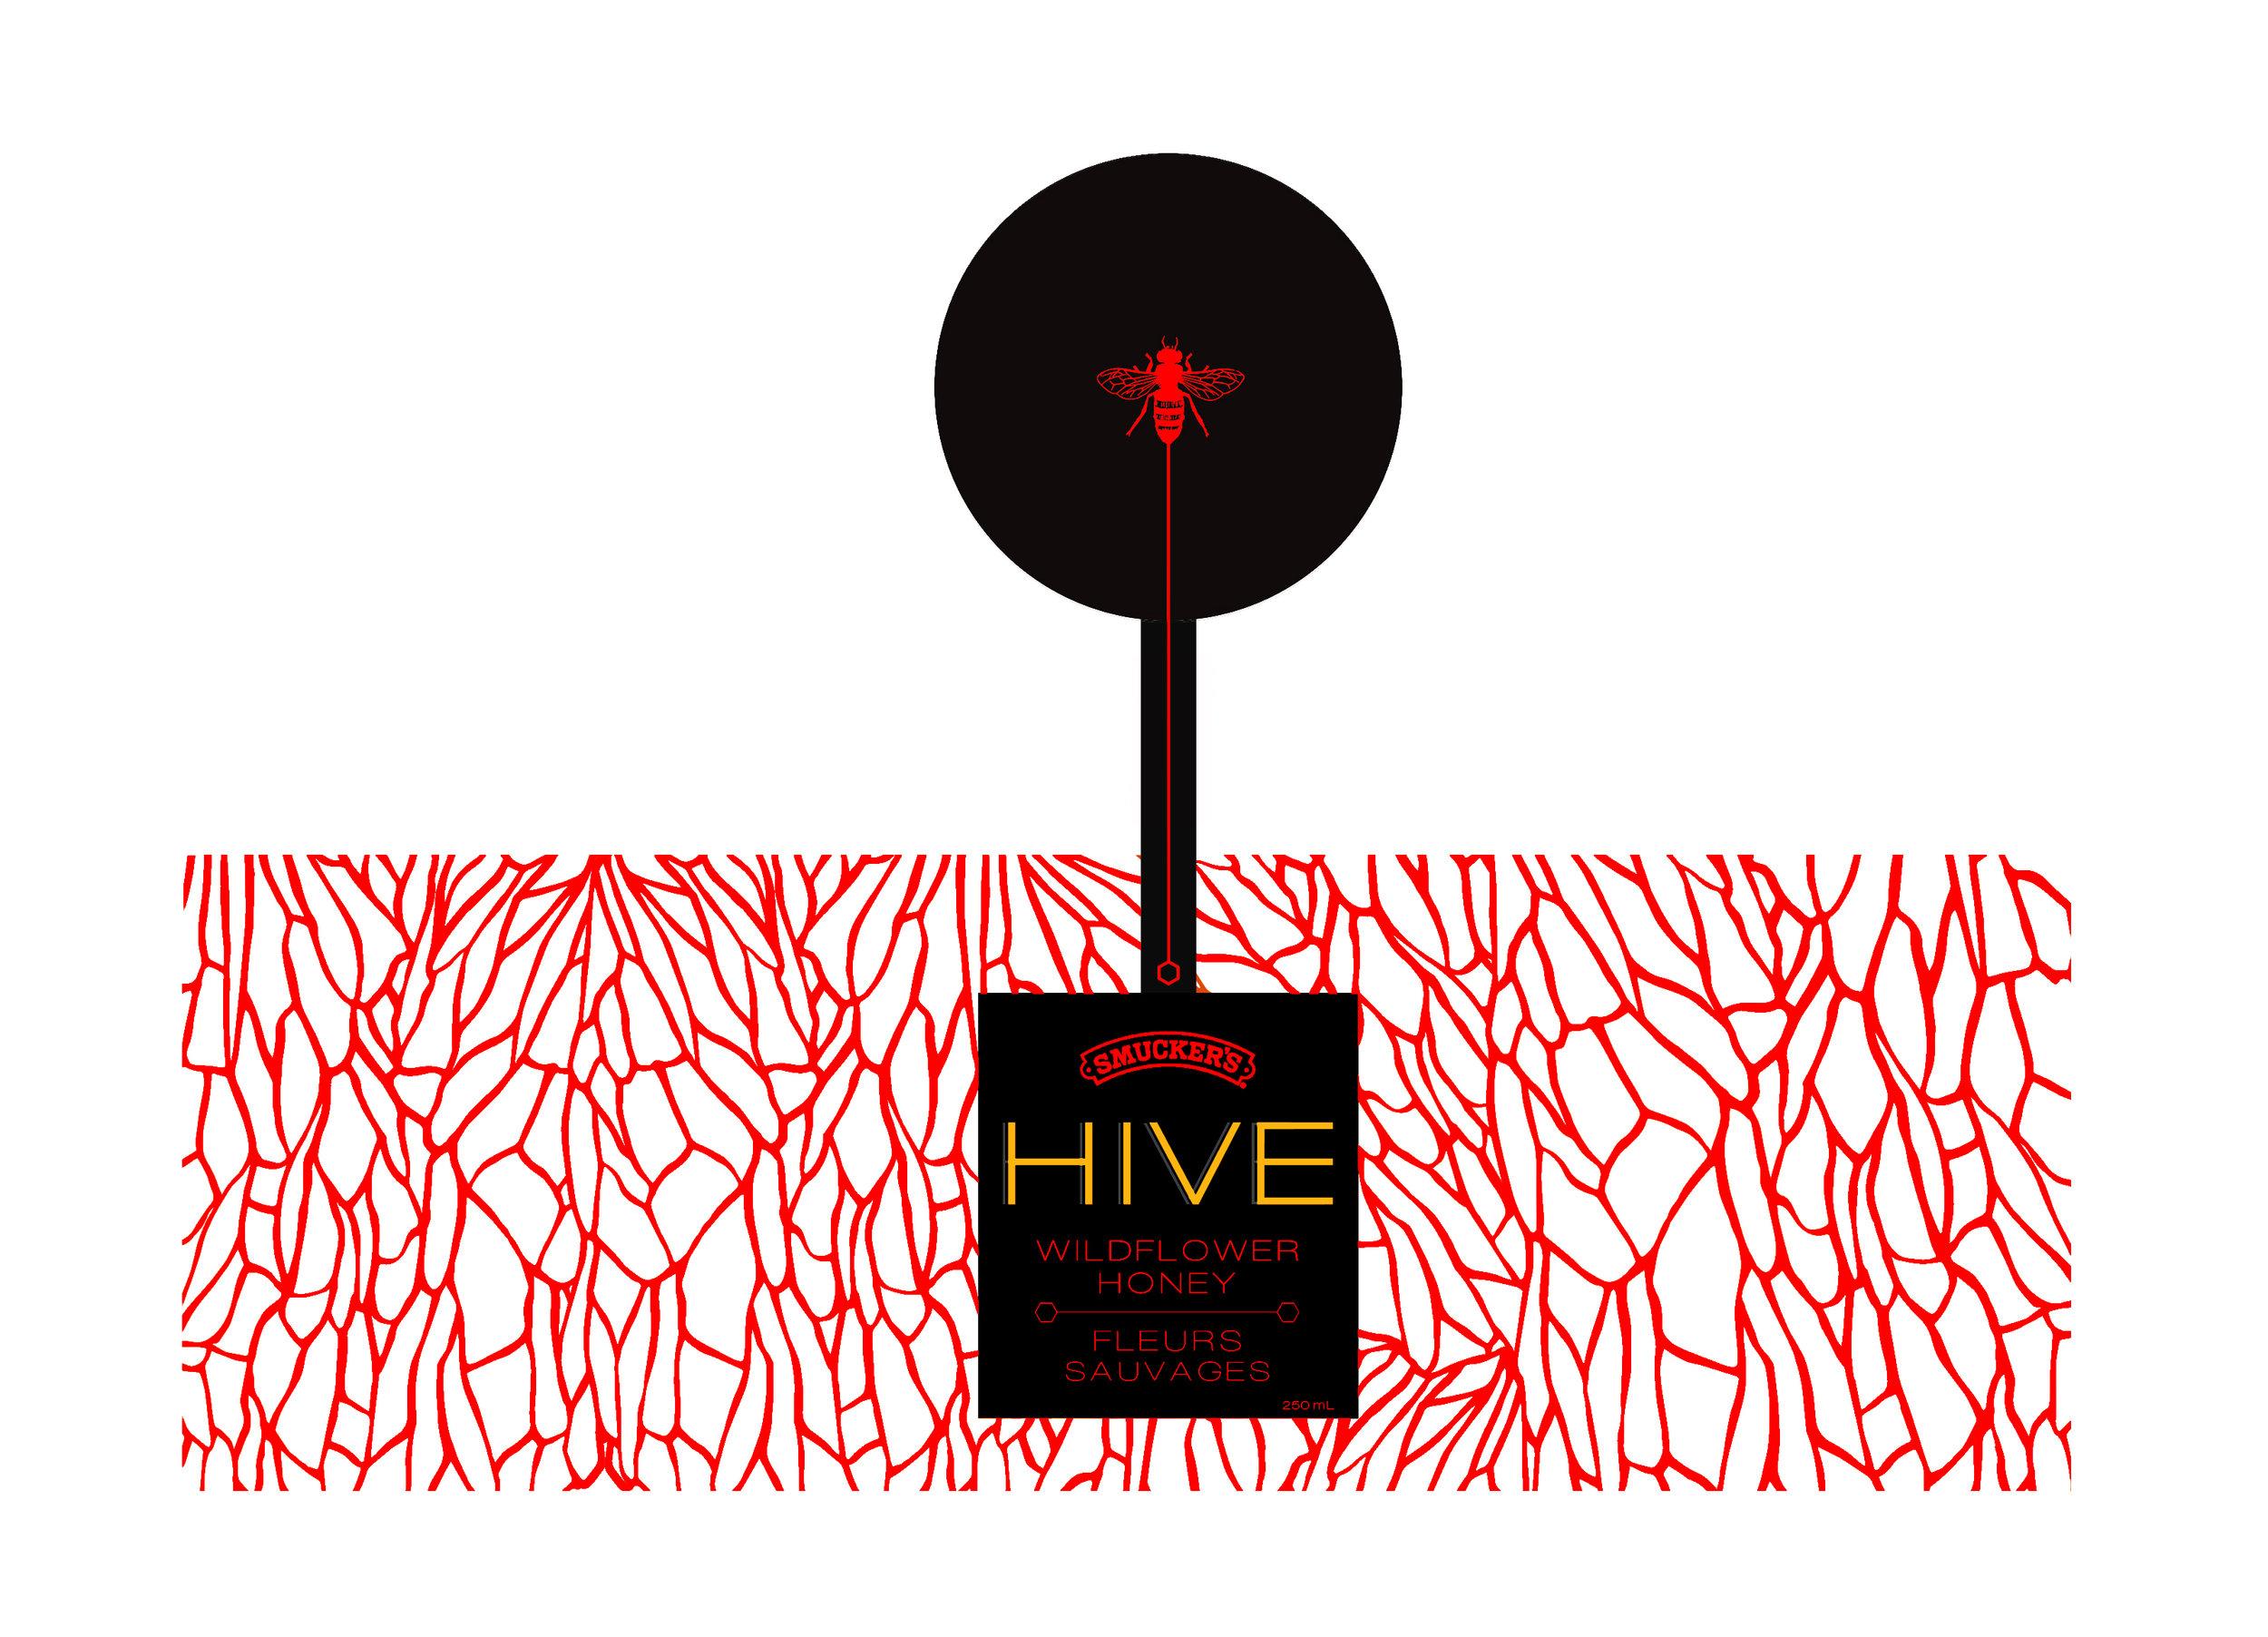 HIVE PACKAGINGPRINT2 copy.jpg